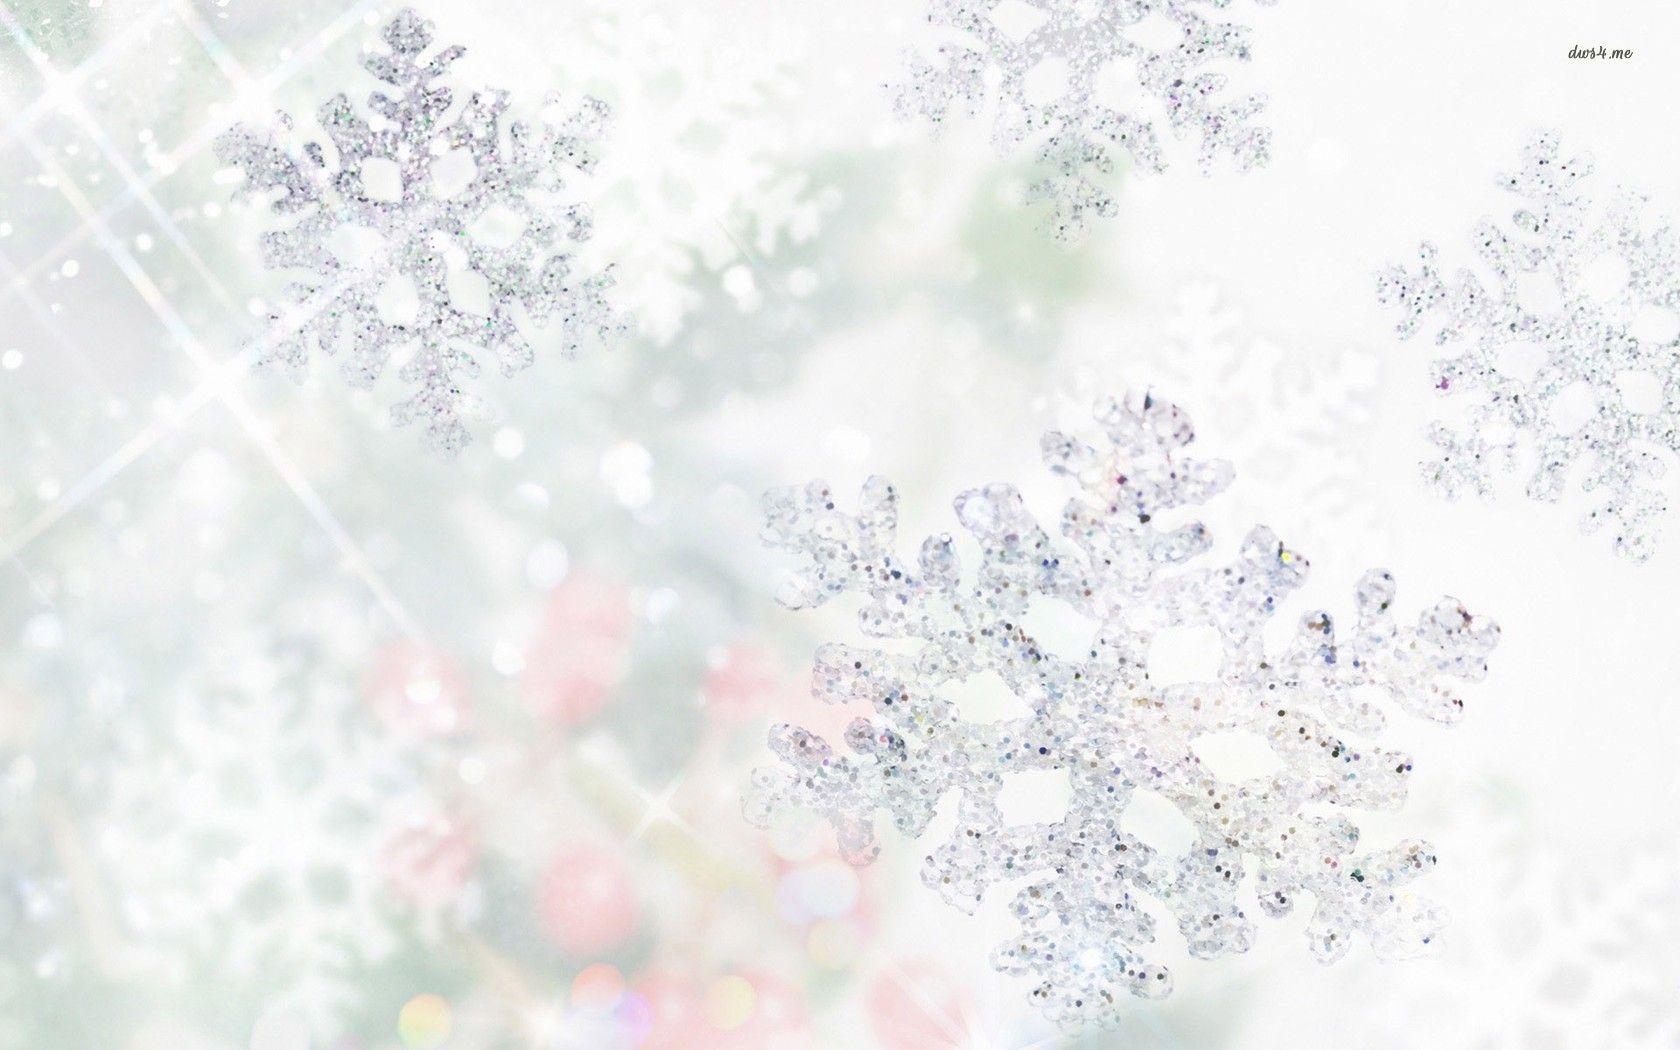 Snowflake wallpaper hd hd wallpapers pinterest wallpaper and hd desktop snowflake wallpaper hd voltagebd Choice Image